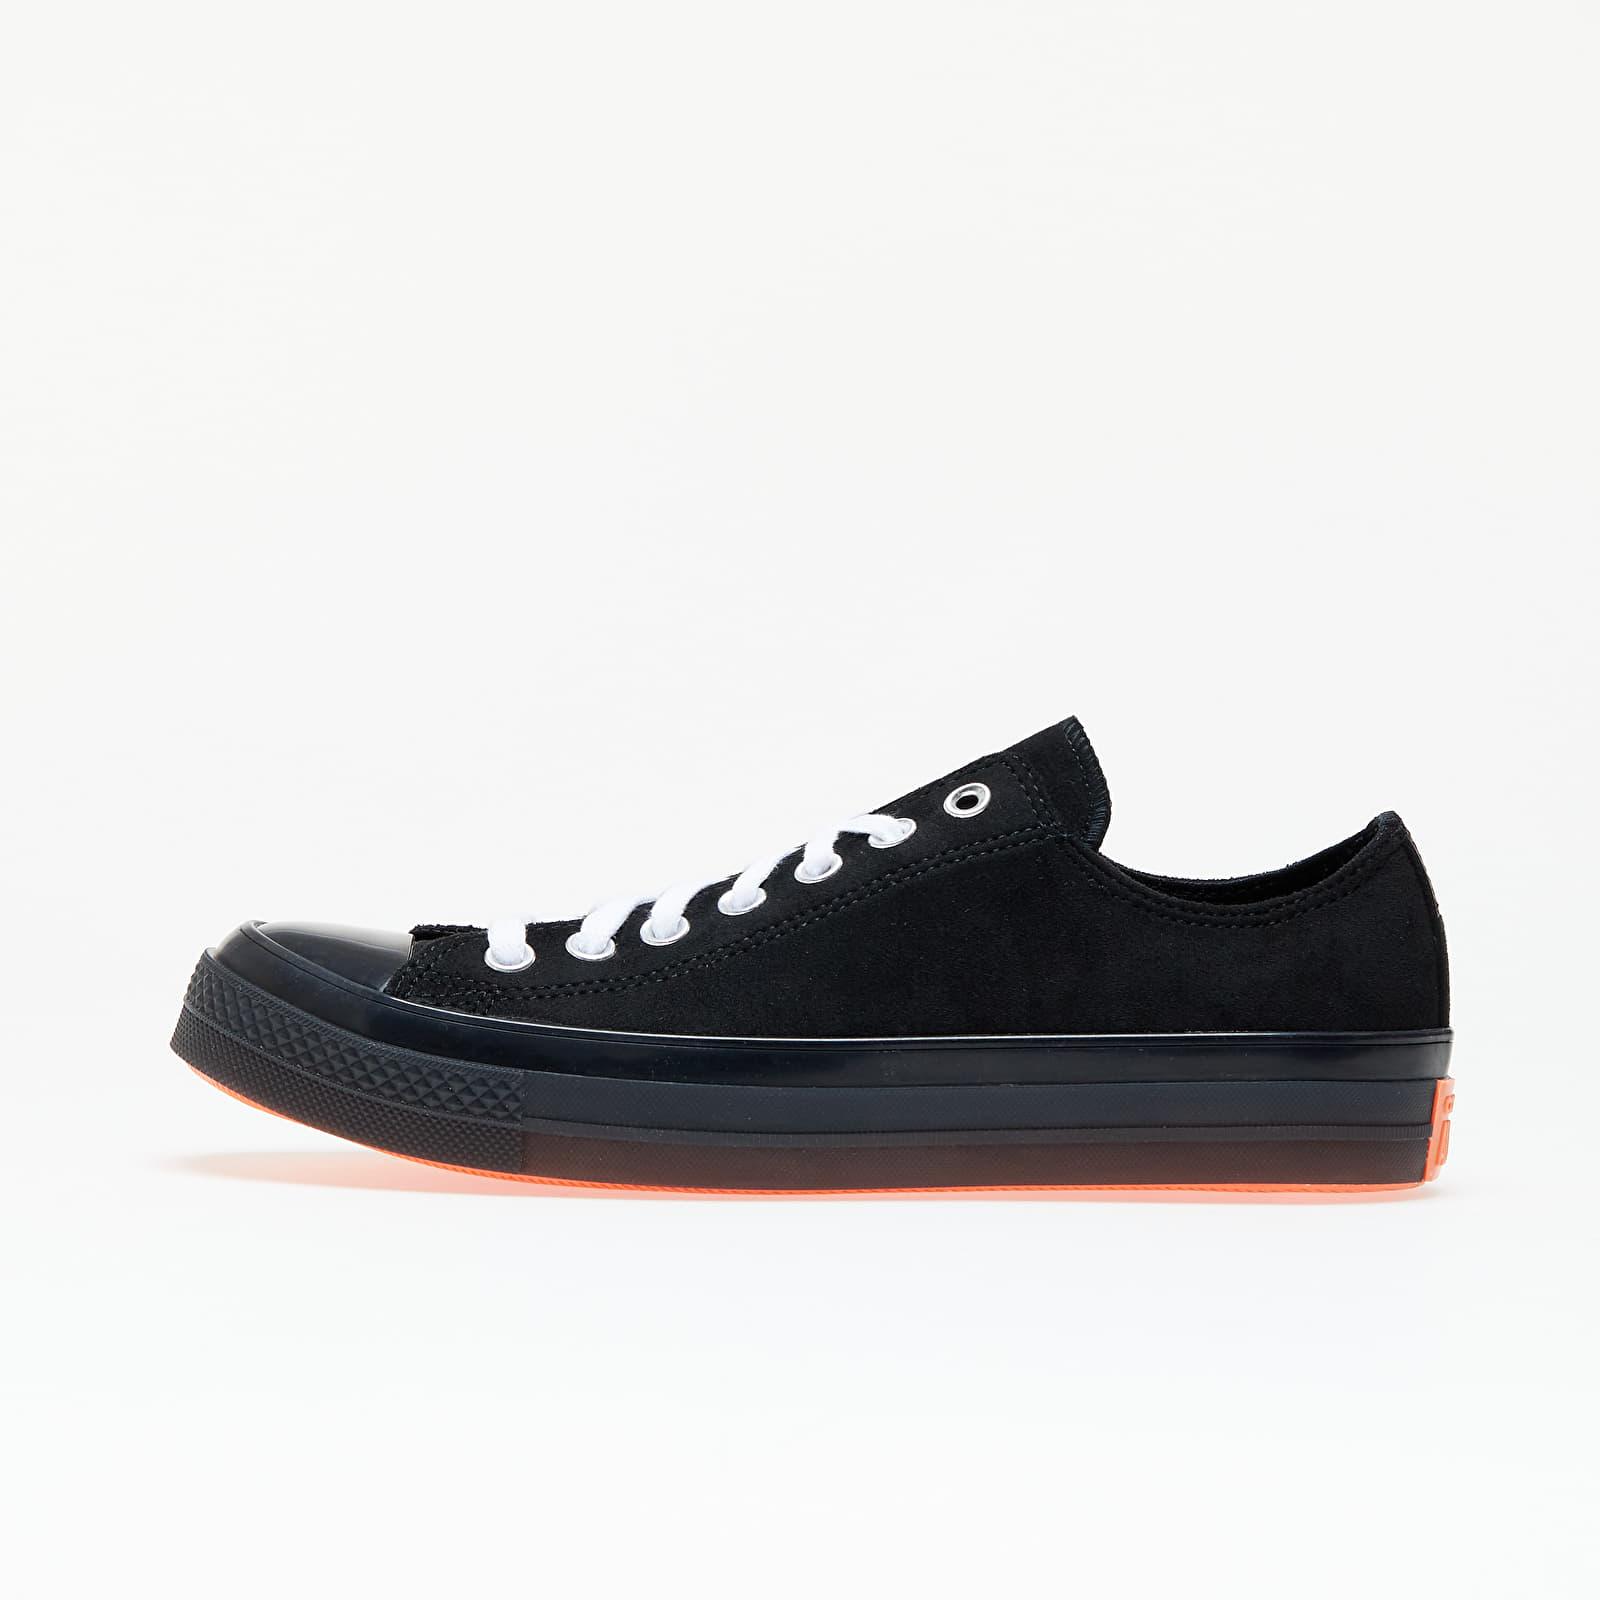 Converse Chuck Taylor All Star CX Black/ Wild Mango/ White 168590C